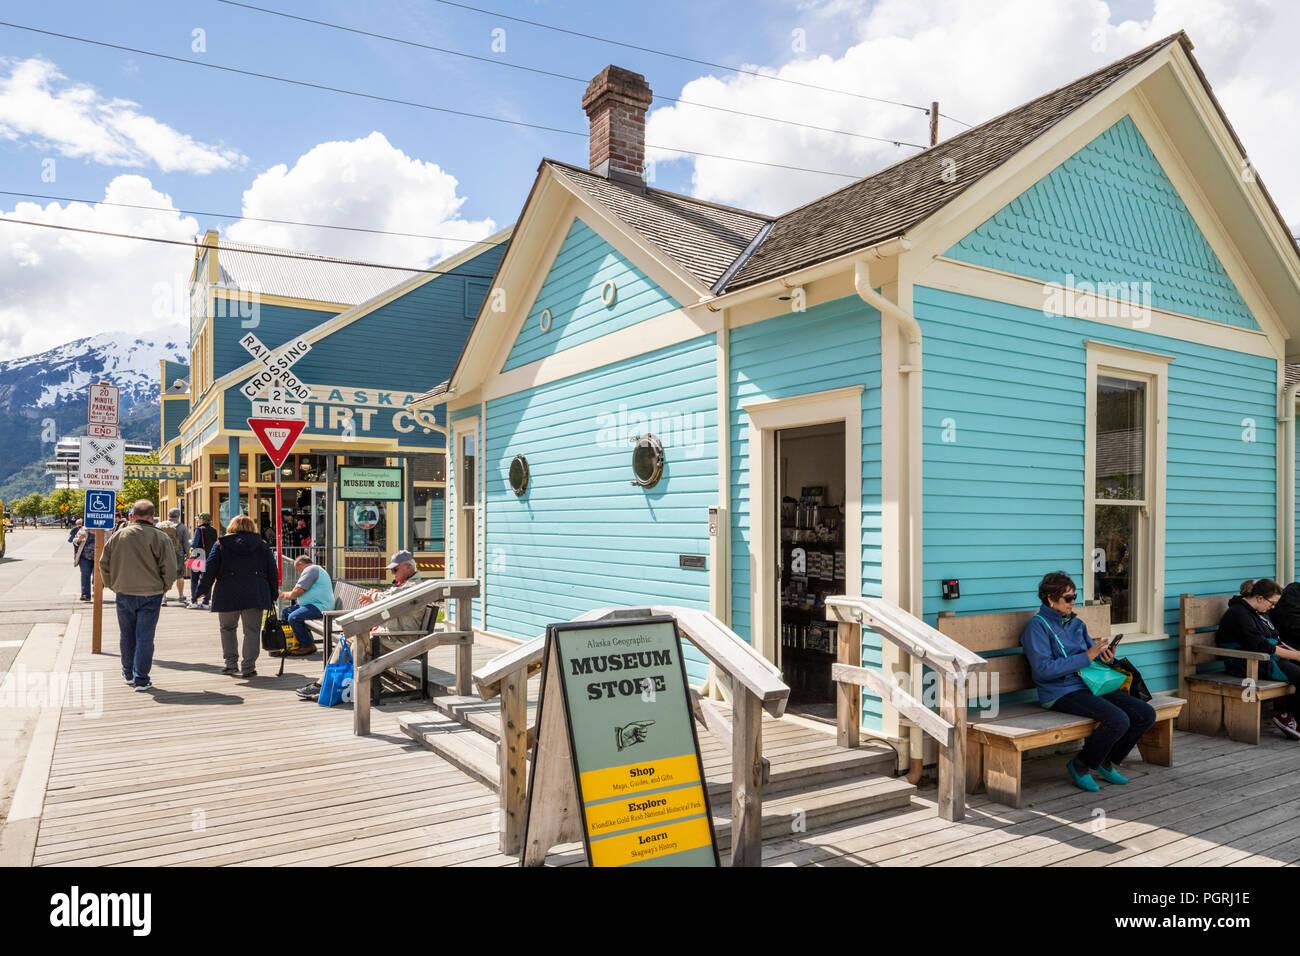 Alaska Geographic Museum Store (National Park Service) in Skagway, Alaska, USA - Stock Image